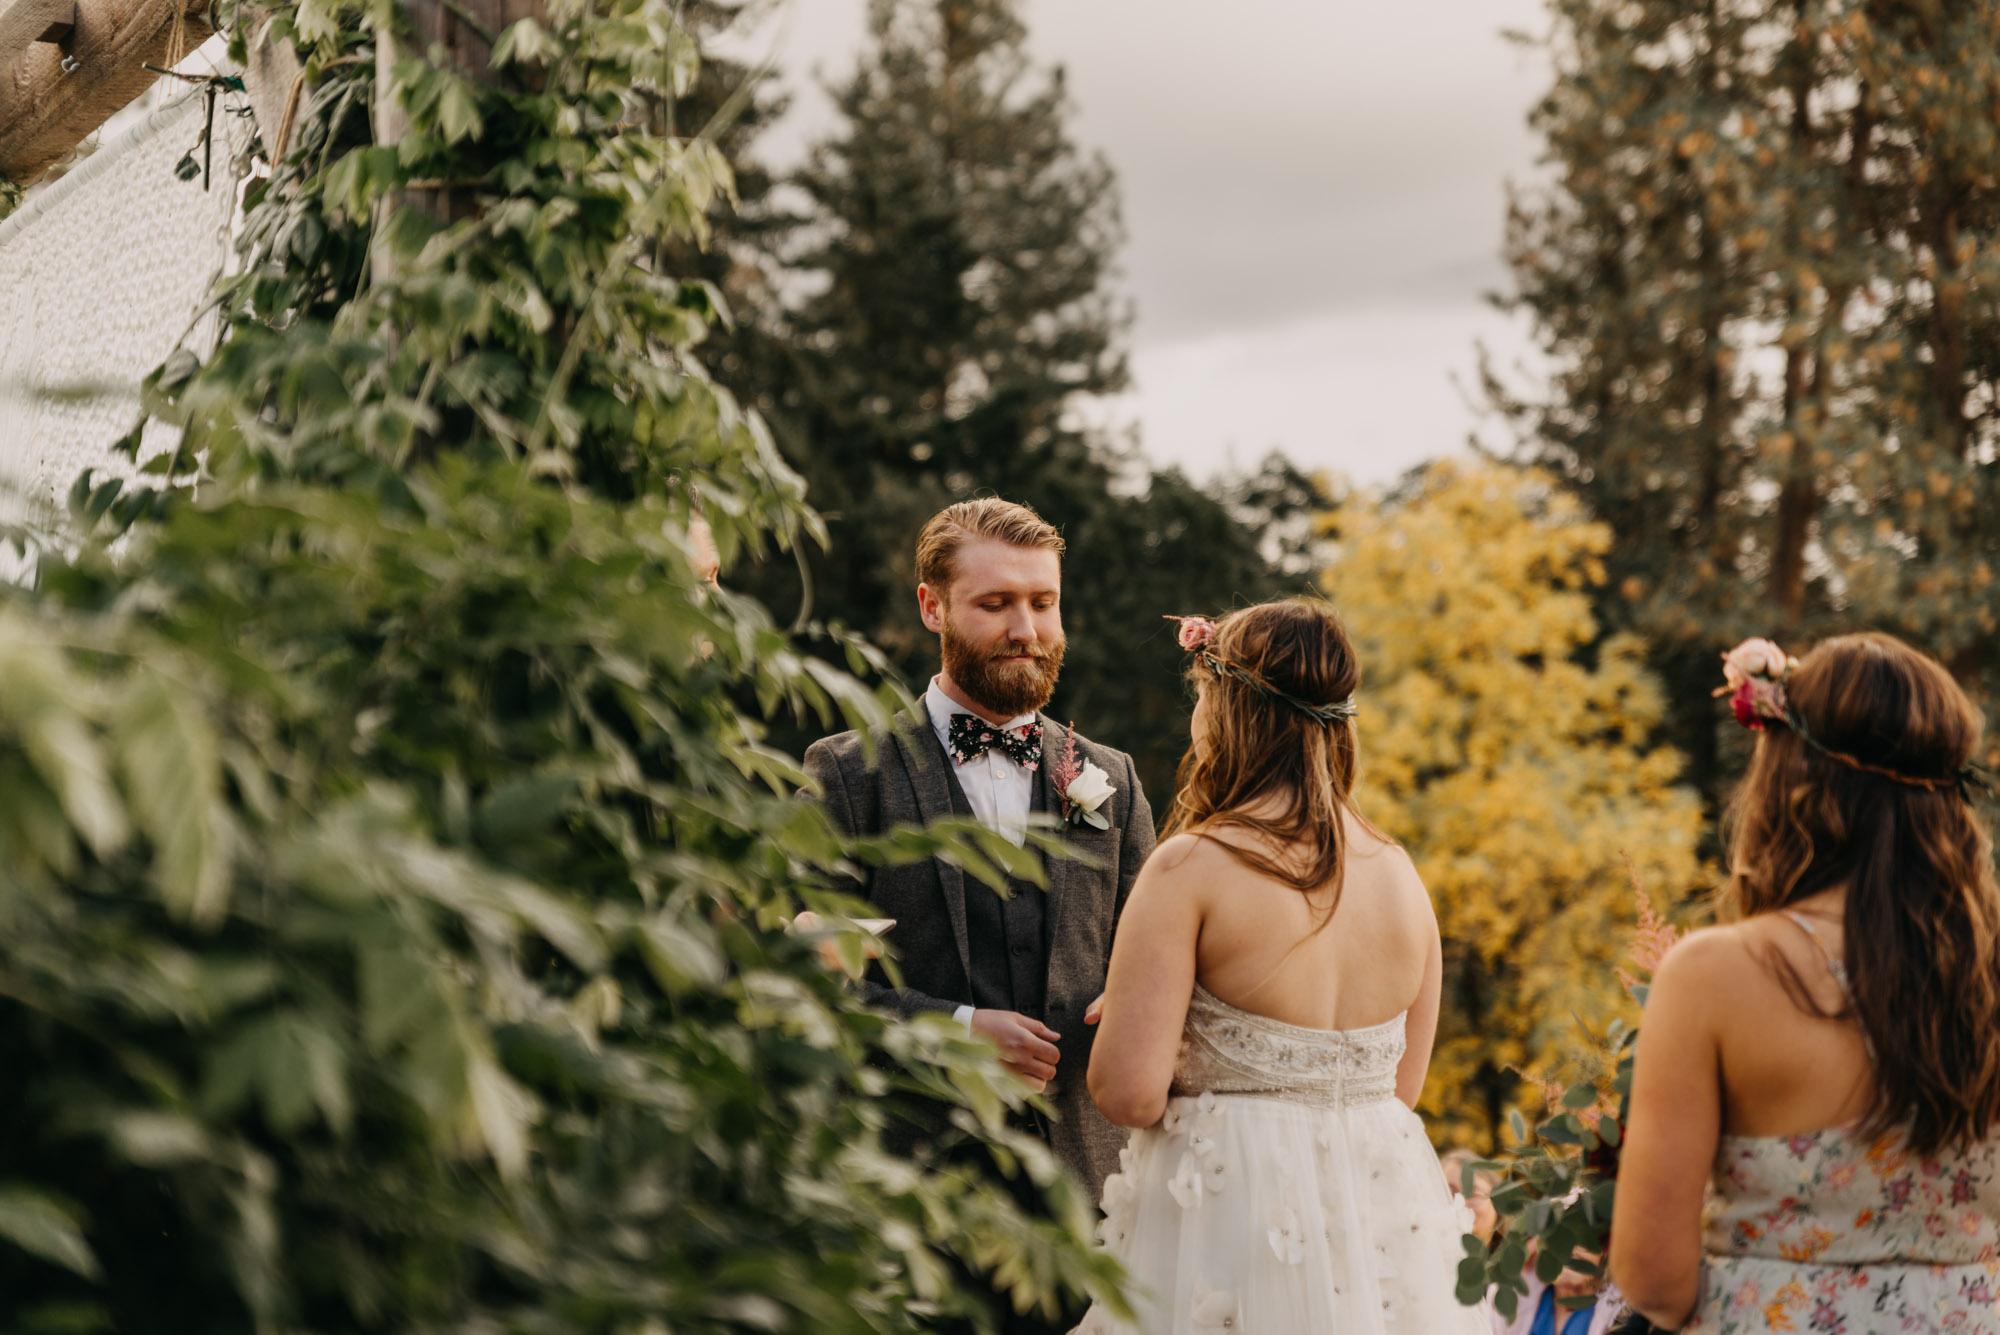 Outdoor-Summer-Ceremony-Washington-Wedding-Rainbow-5413.jpg